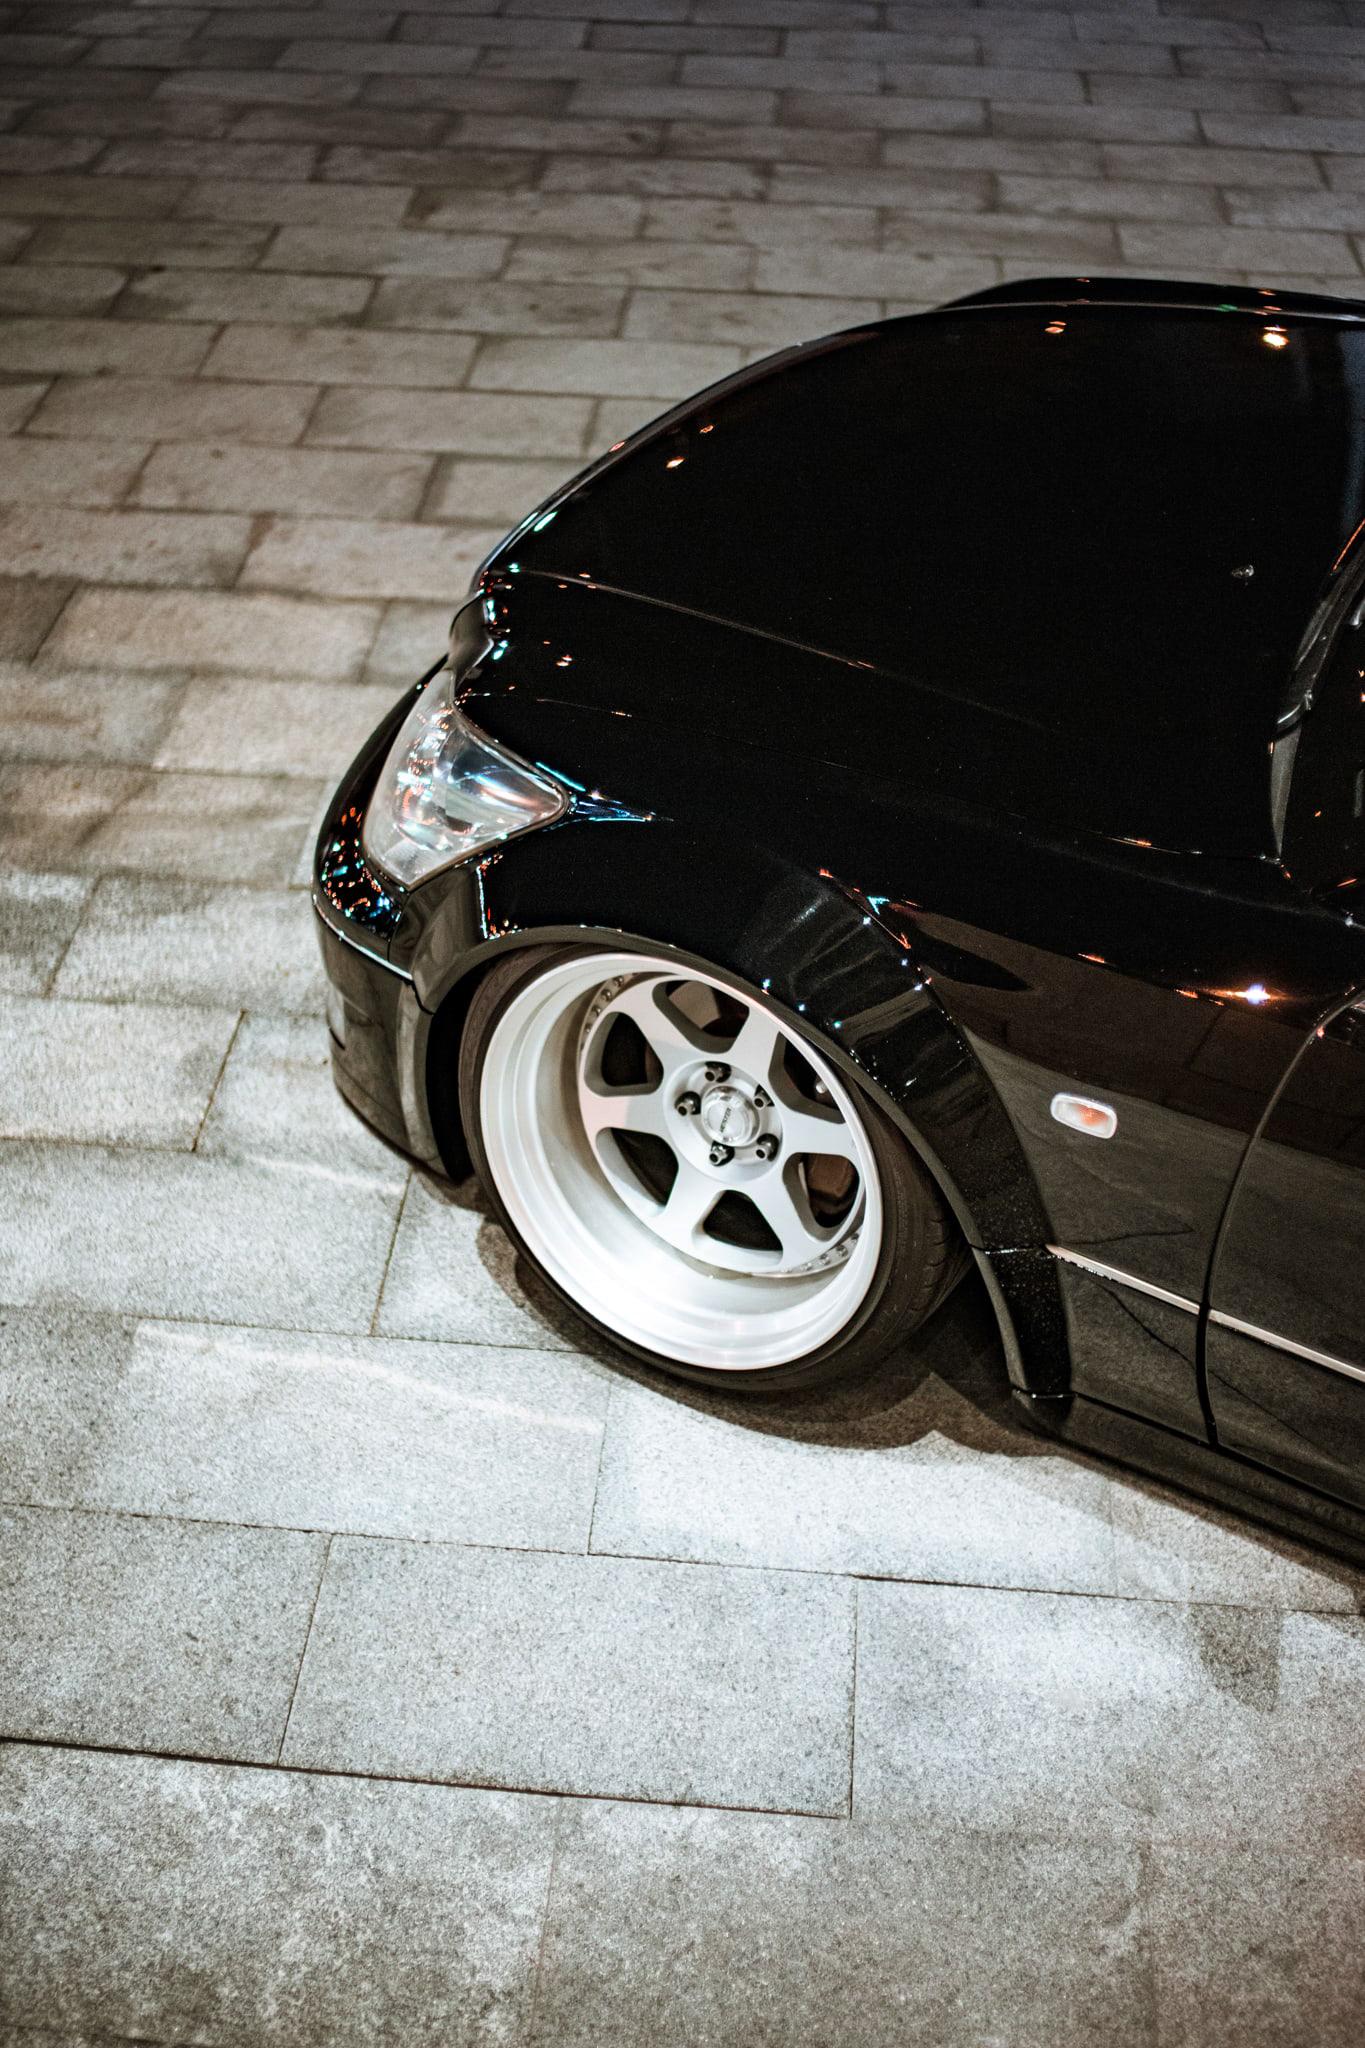 Lexus Work Wheels